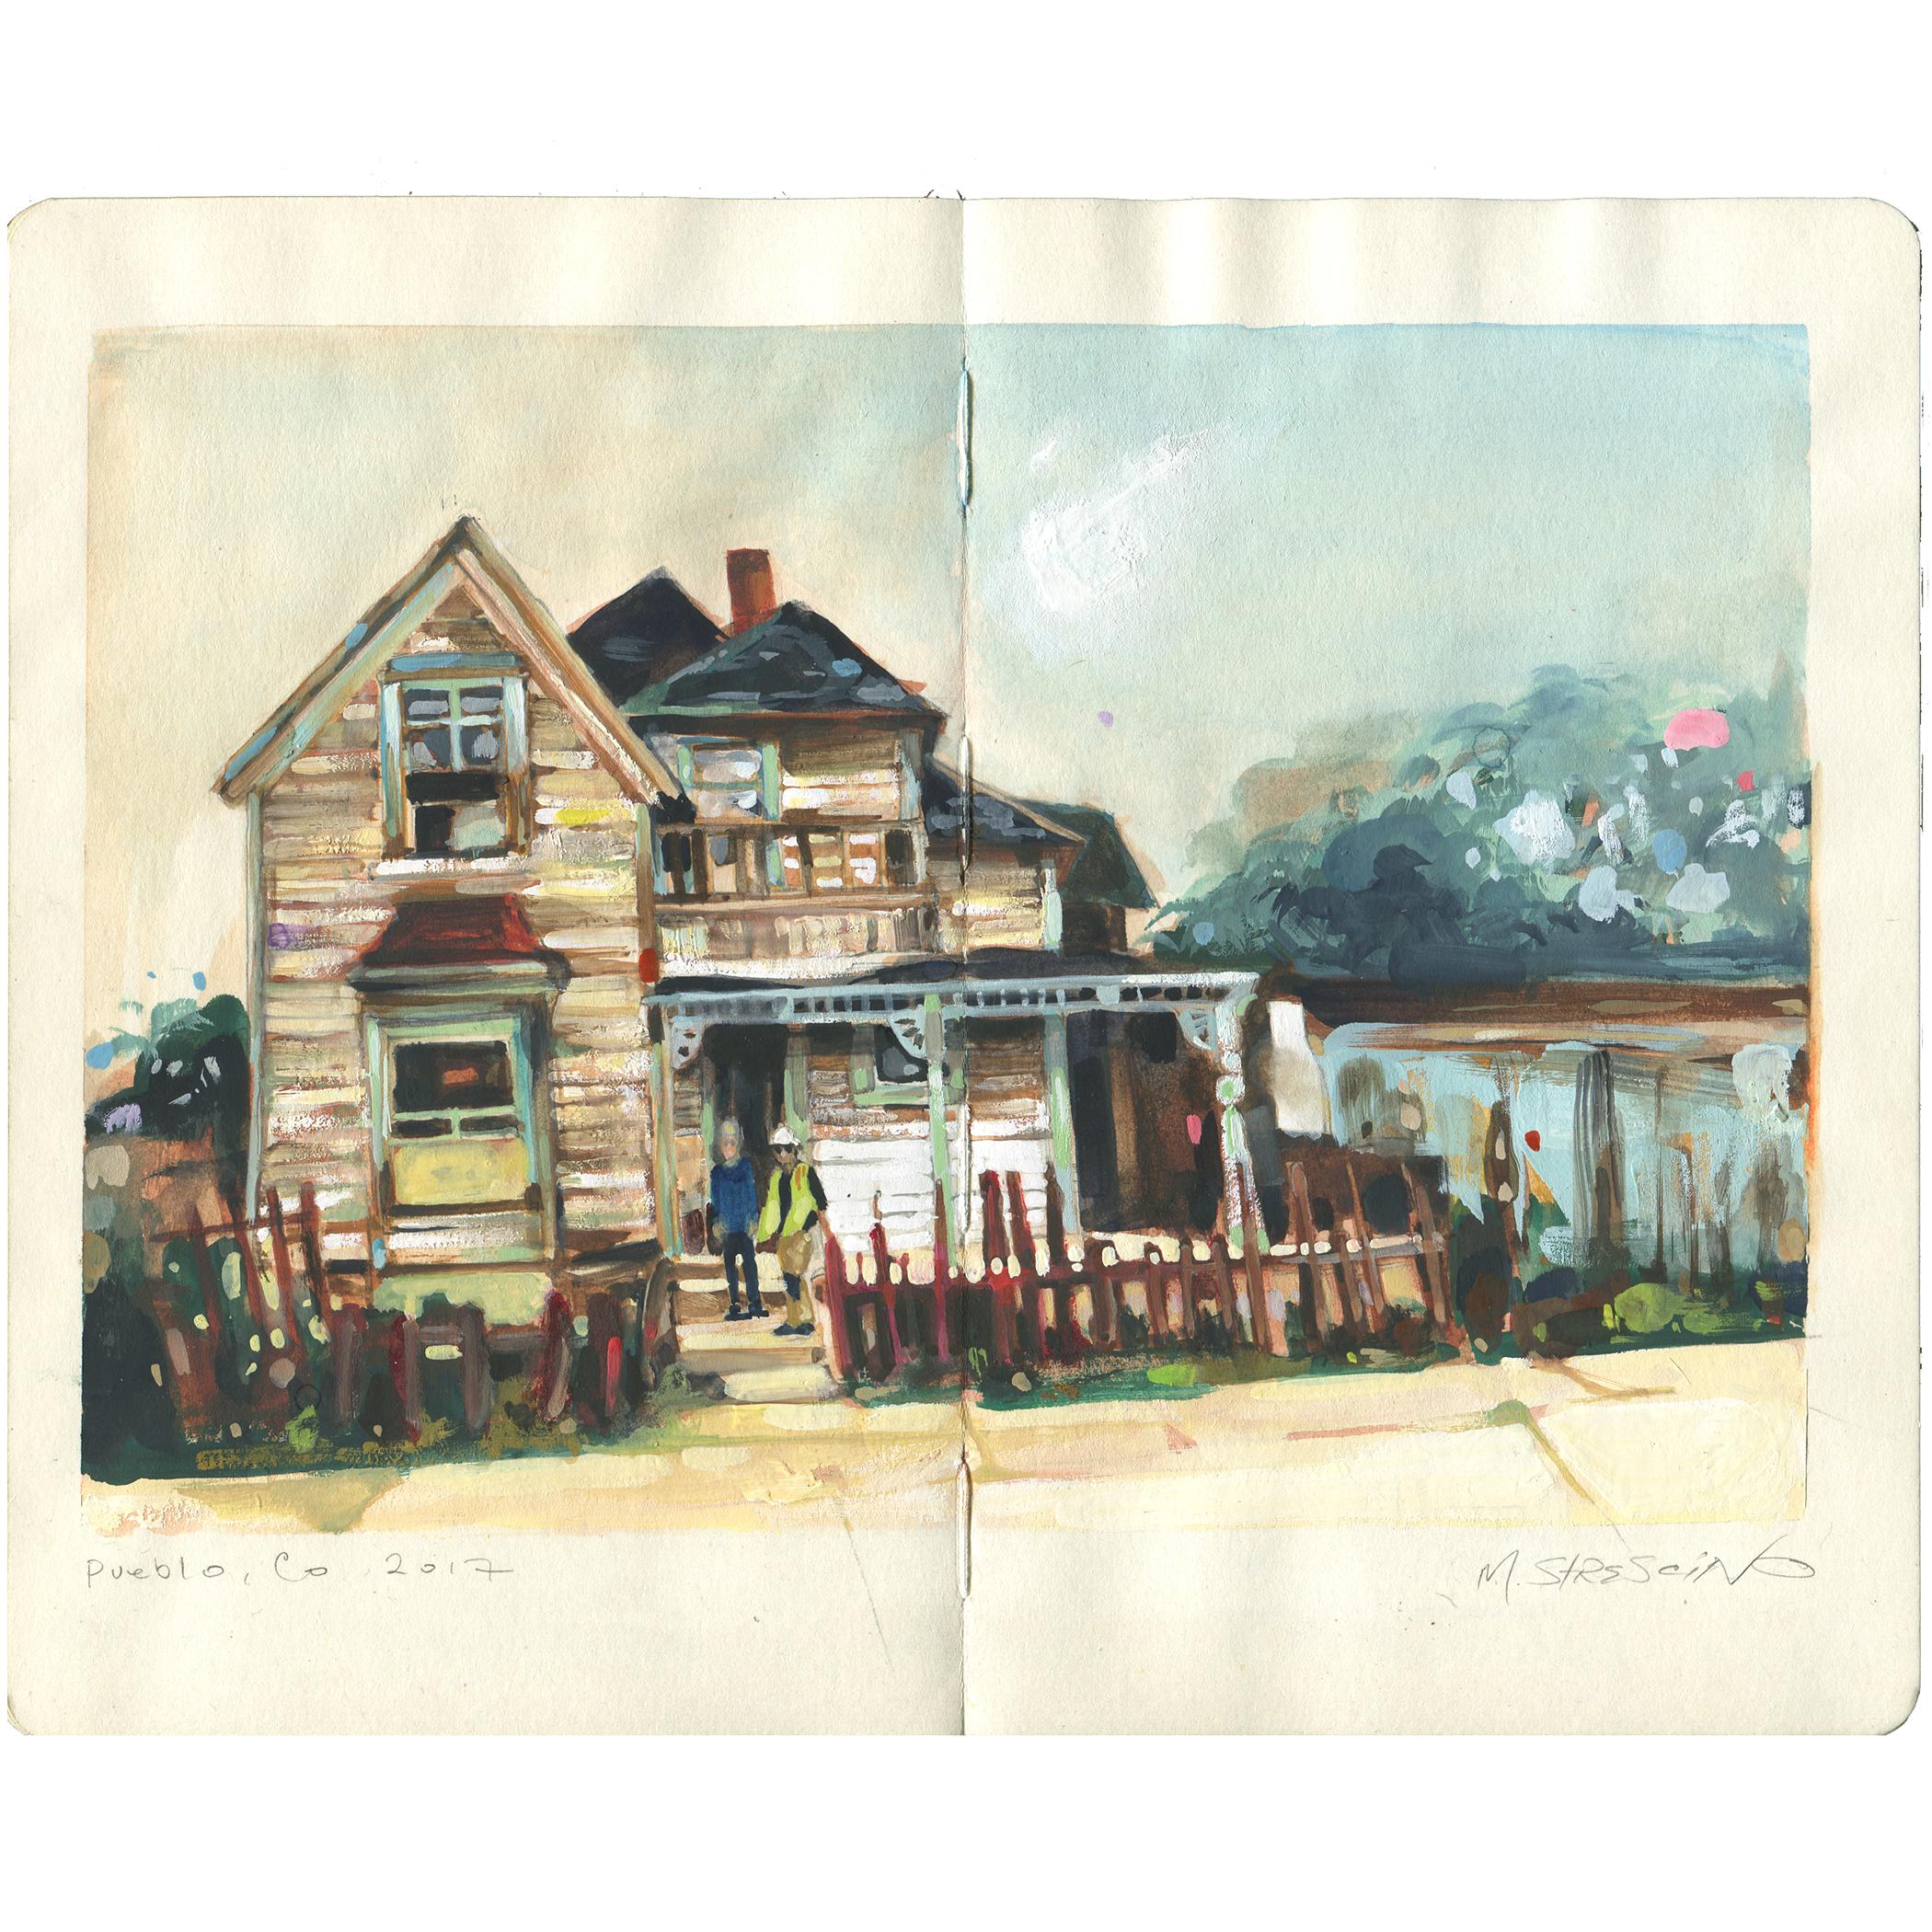 Condemned house, west side Pueblo, colorado (since demolished) - watercolor + gouache on moleskine